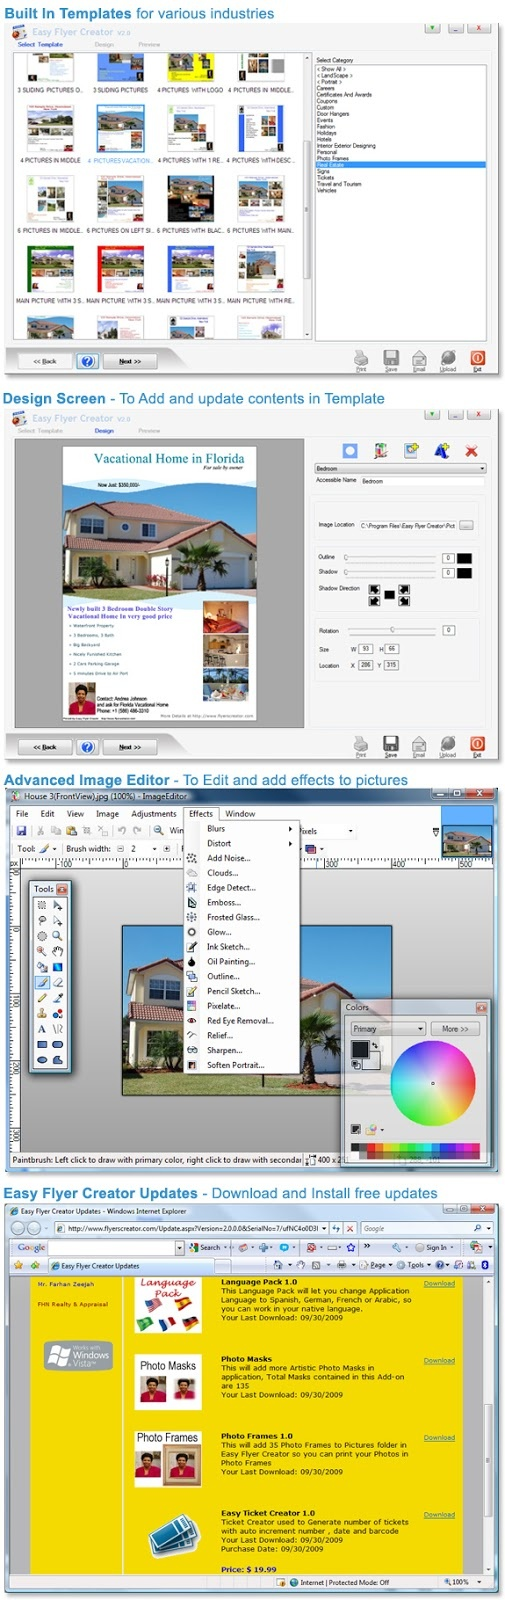 mejores ideas sobre flyer creator en palimpseste easy flyer creator v3 0 final keygen mc4